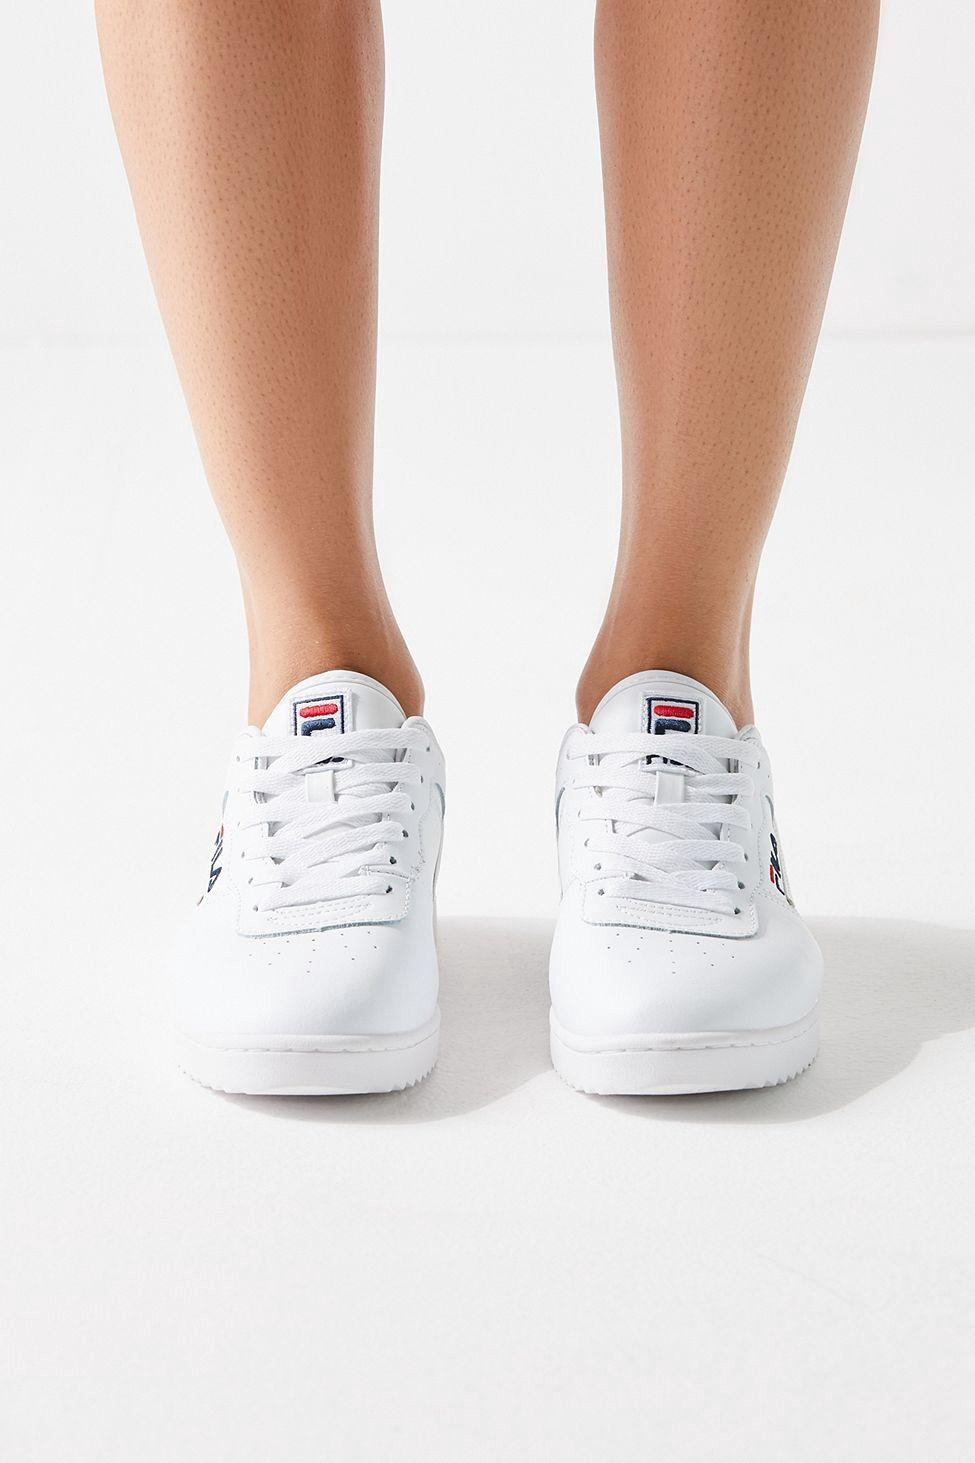 a6fa175d67b0 Urban Outfitters Fila Original Fitness Ripple Sneaker - Black 6 ...